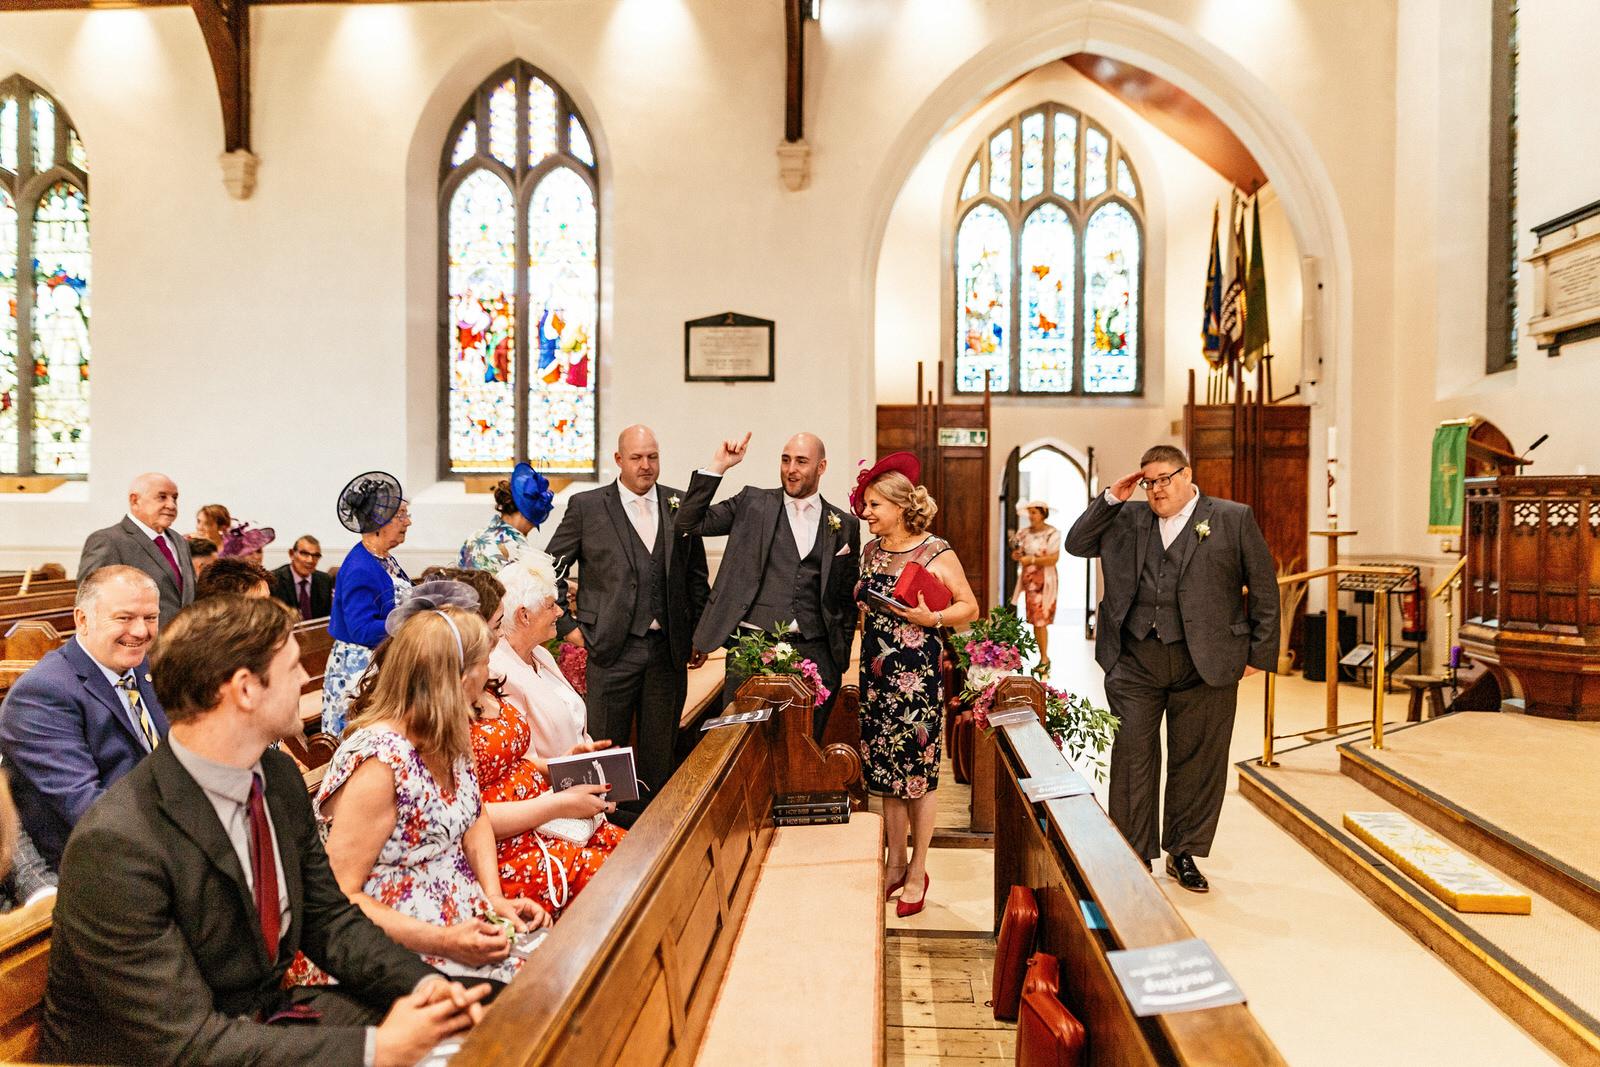 Beamish-Hall-Wedding-Photographer-006.jpg